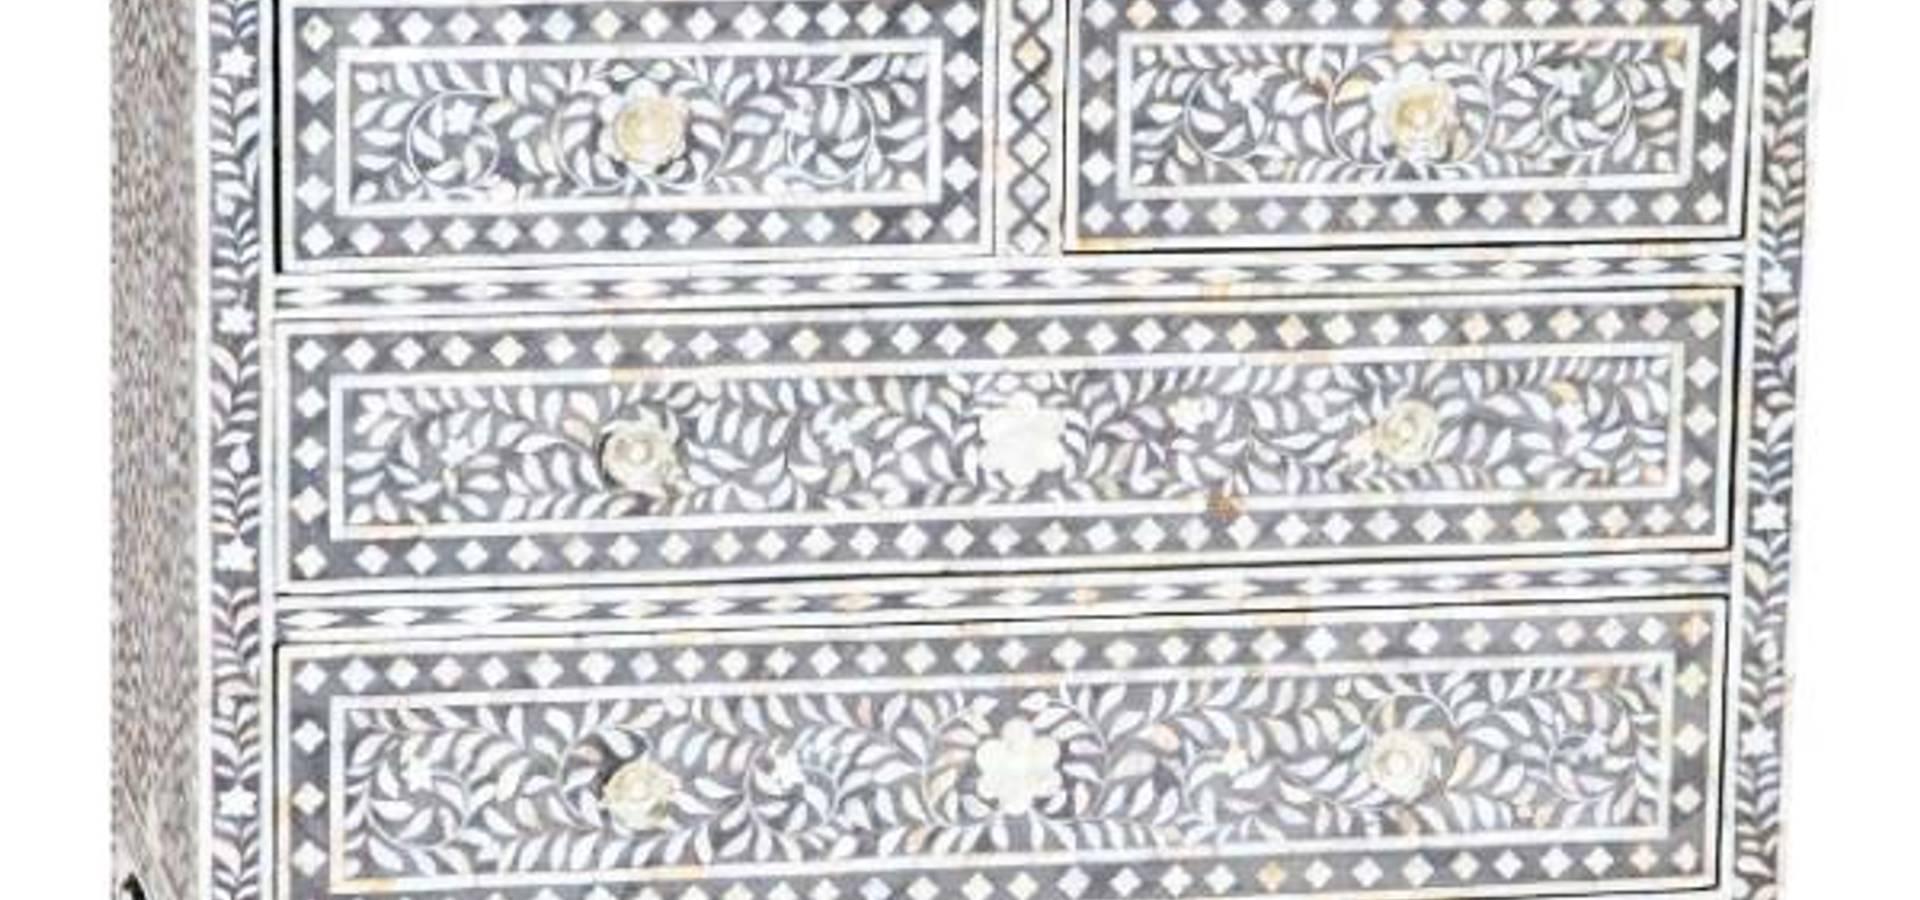 Prakash Handicraft